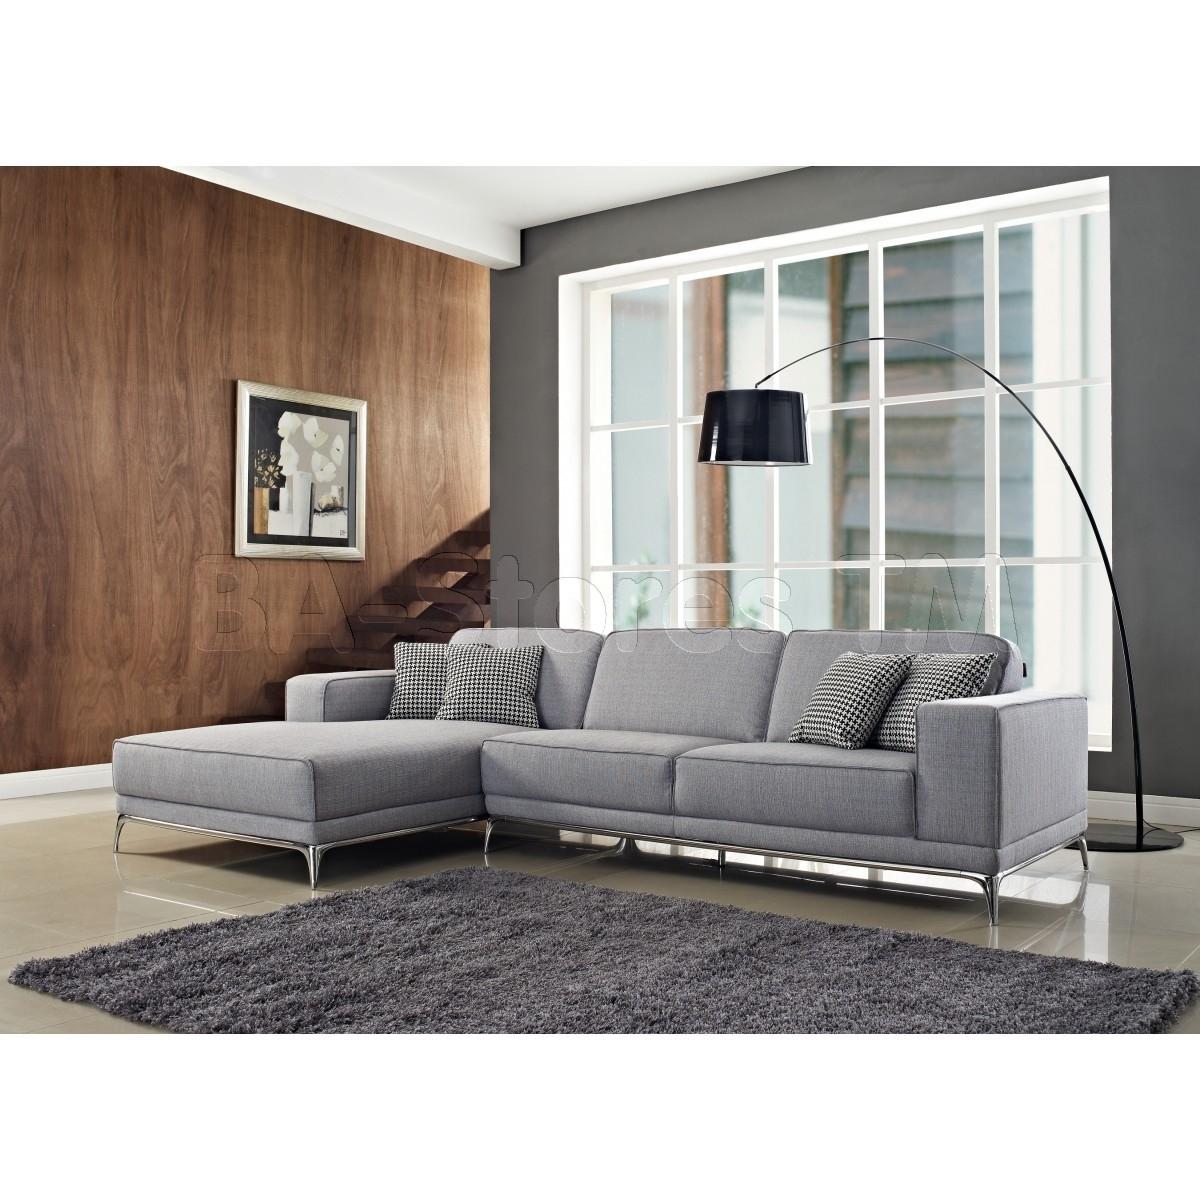 Agata Sectional Sofa | Light Grey - $2,475.00 : Furniture Store for Light Grey Sectional Sofas (Image 1 of 10)